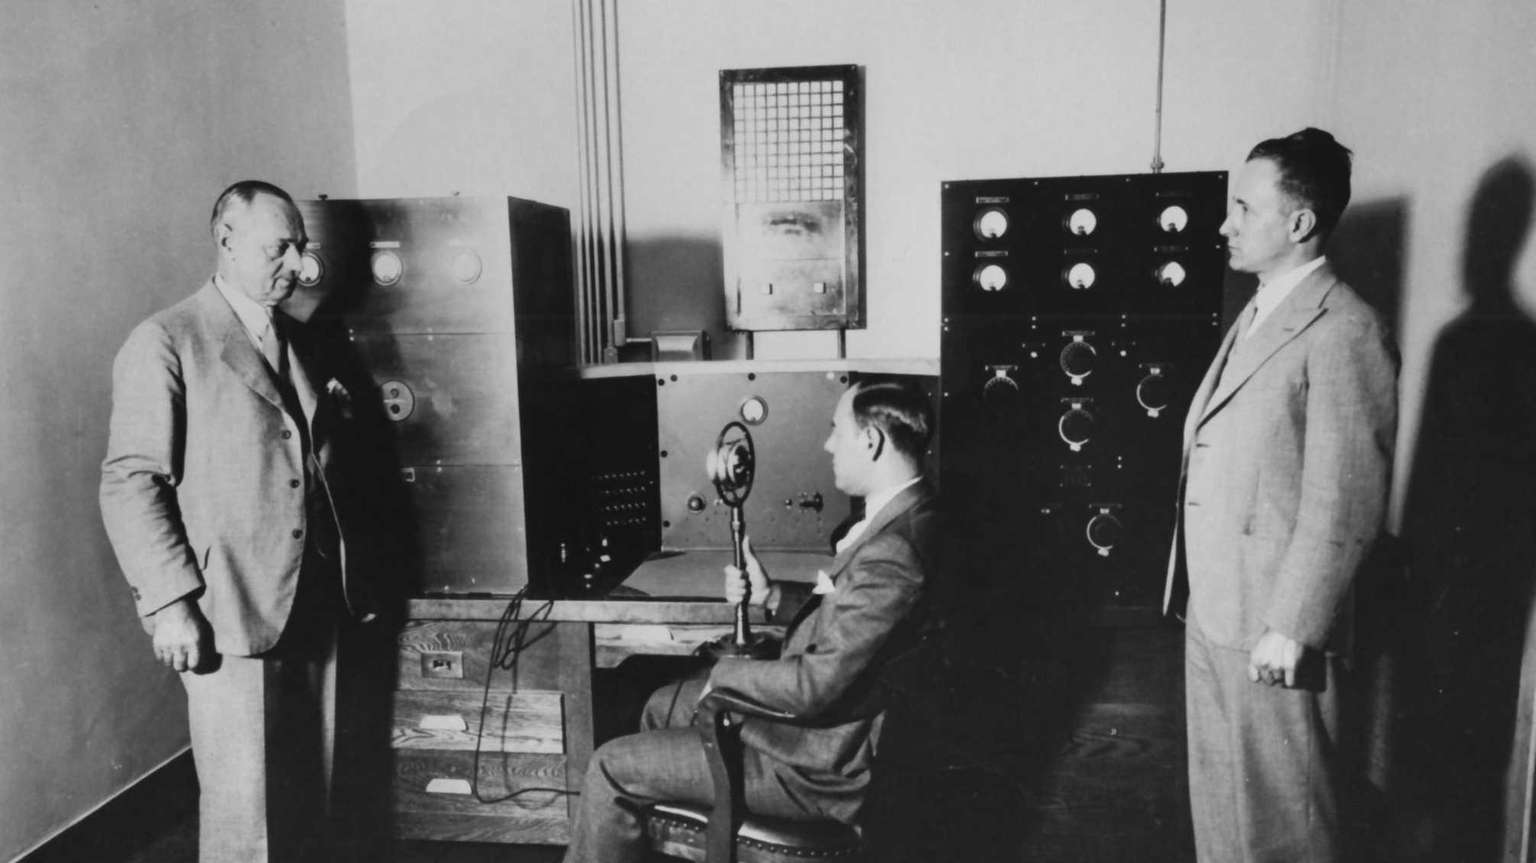 The original communications room of the Nassau County